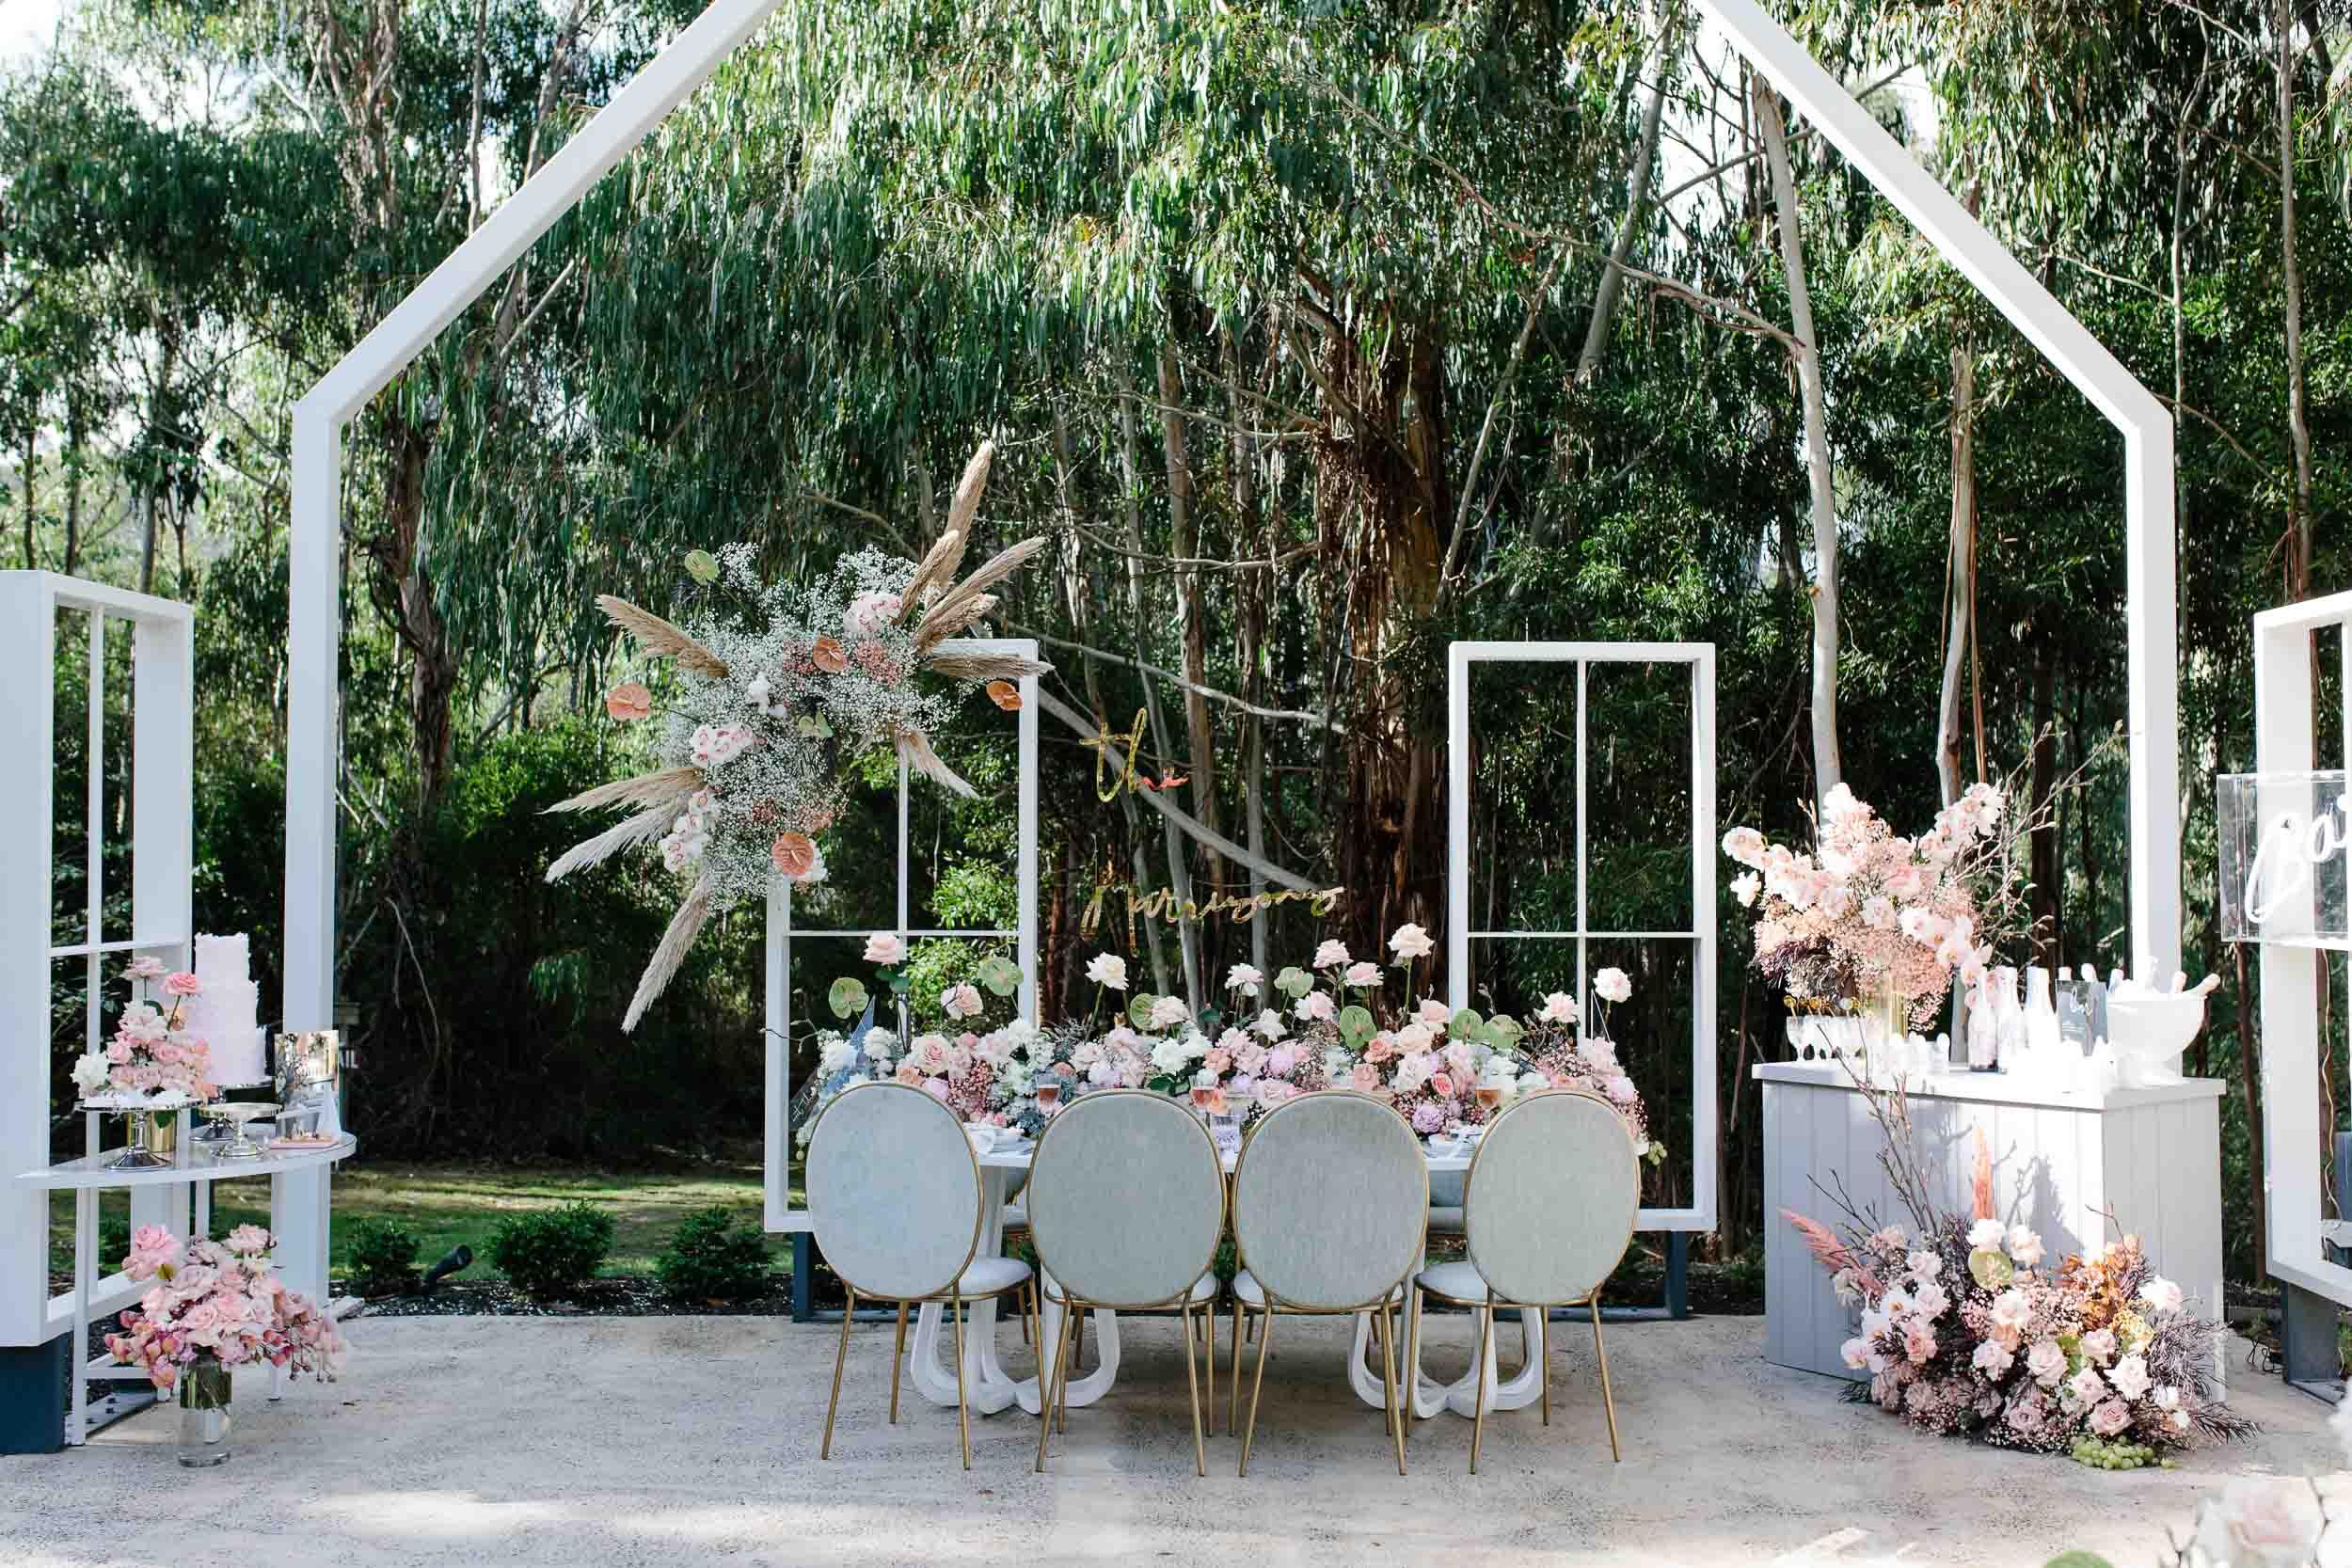 Kas-Richards-LENZO-Yarra-Valley-Wedding-One-Day-Bridal-30.jpg